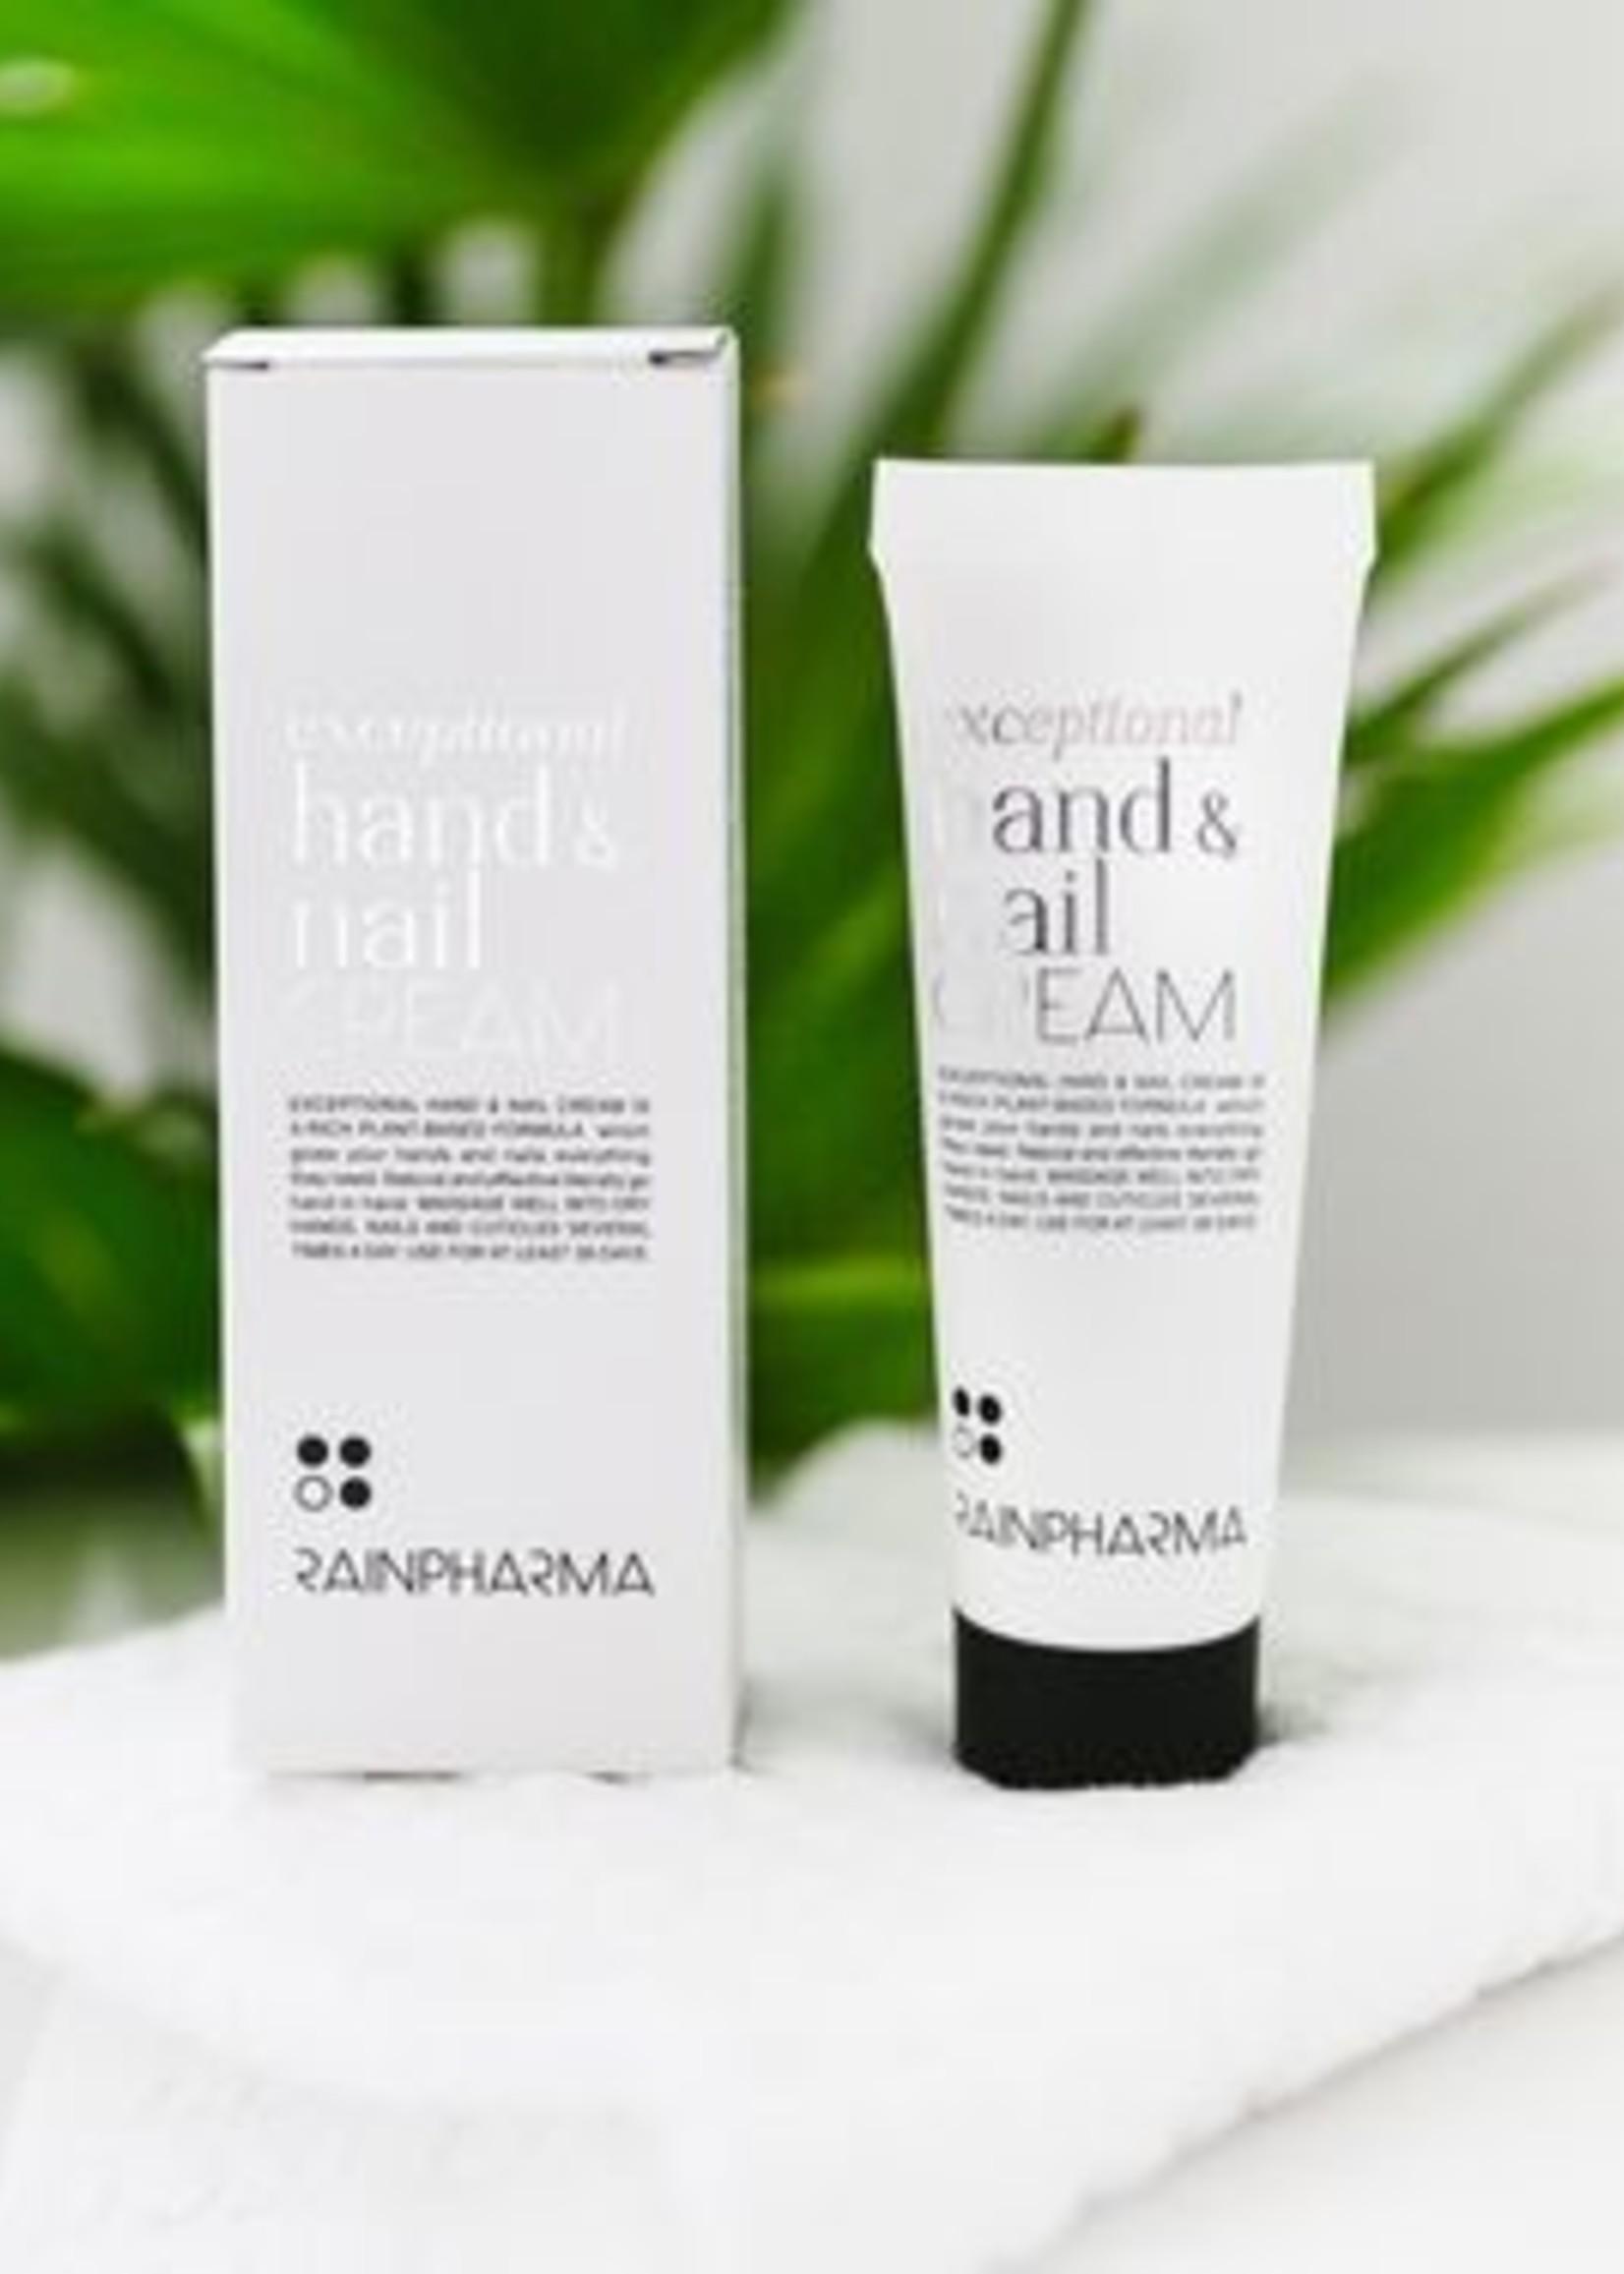 Rainpharma EXCEPTIONAL HAND & NAIL CREAM